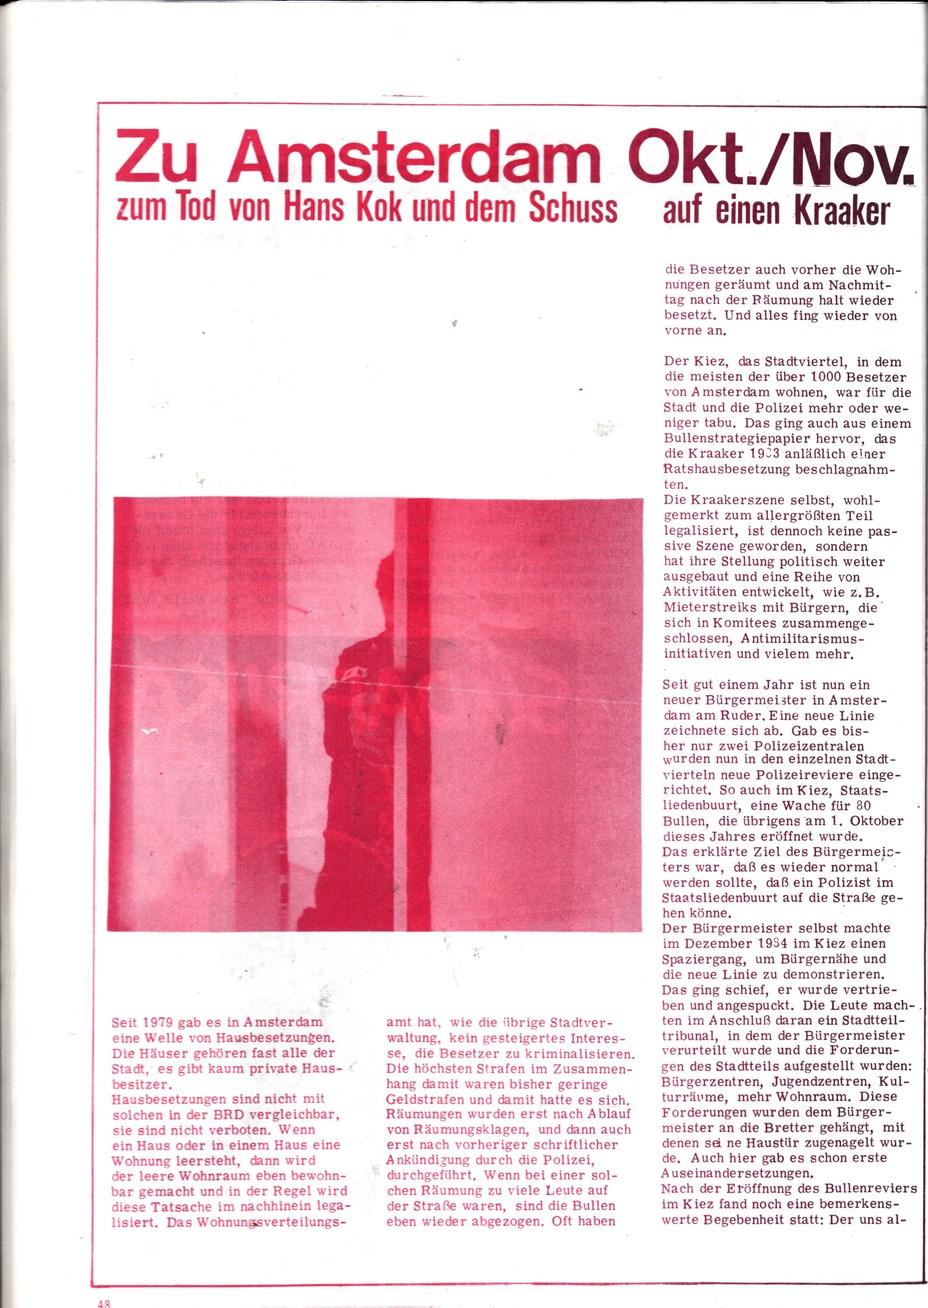 Frankfurt_Aktion_19860100_001_052